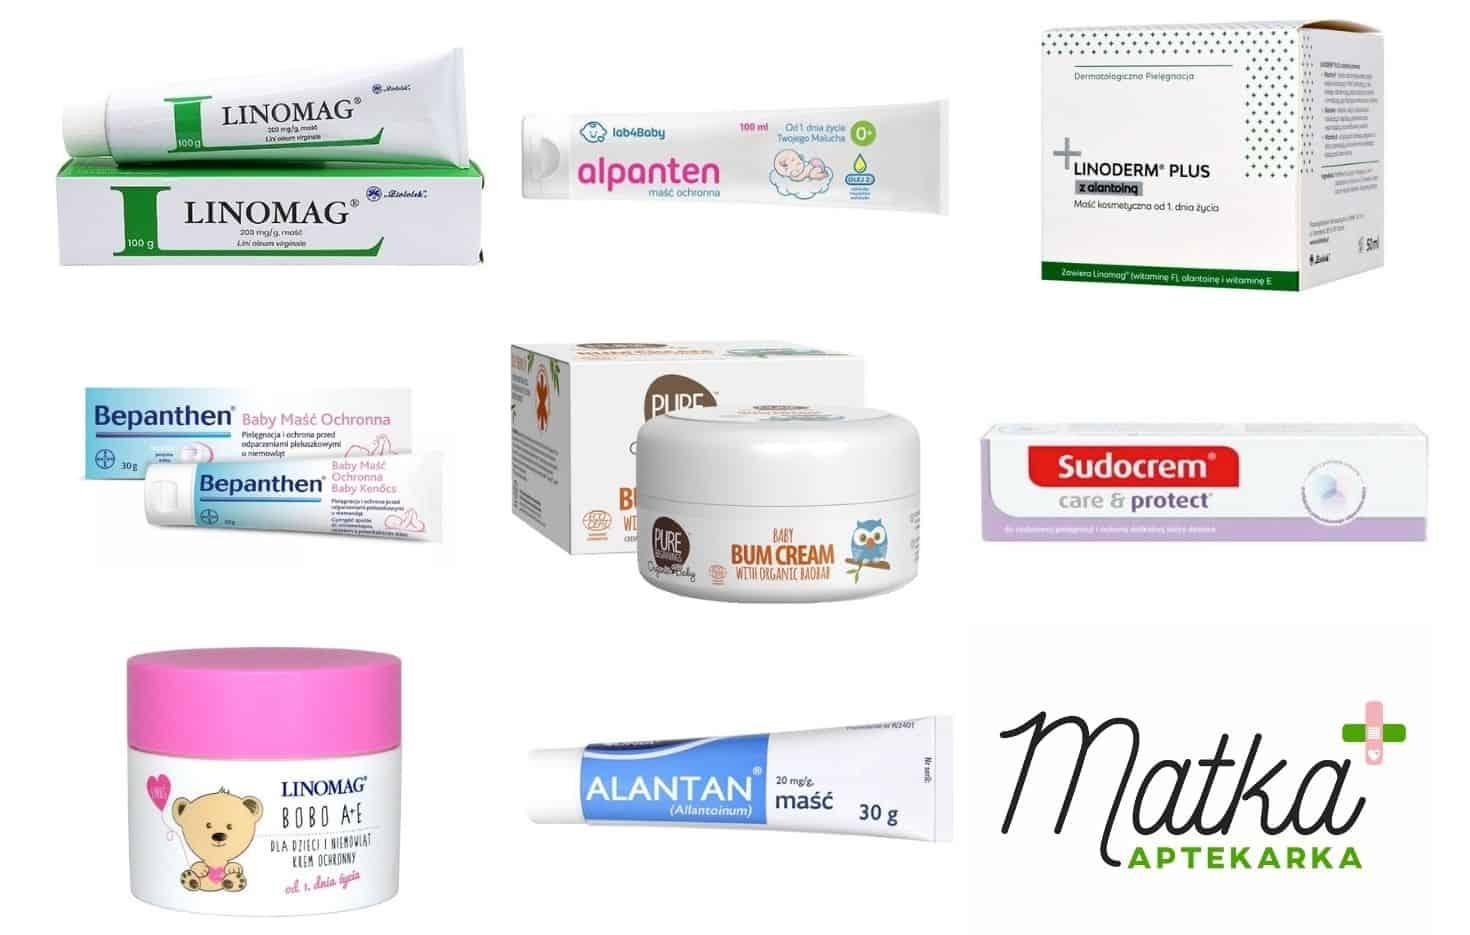 Maść ochronna napupę isuchą skórę, nawilża, regeneruje Linomag, Alantan Plus, Linomag Bobo A+E, Bepanthen, alpanten, pure beginnings, Matka Aptekarka